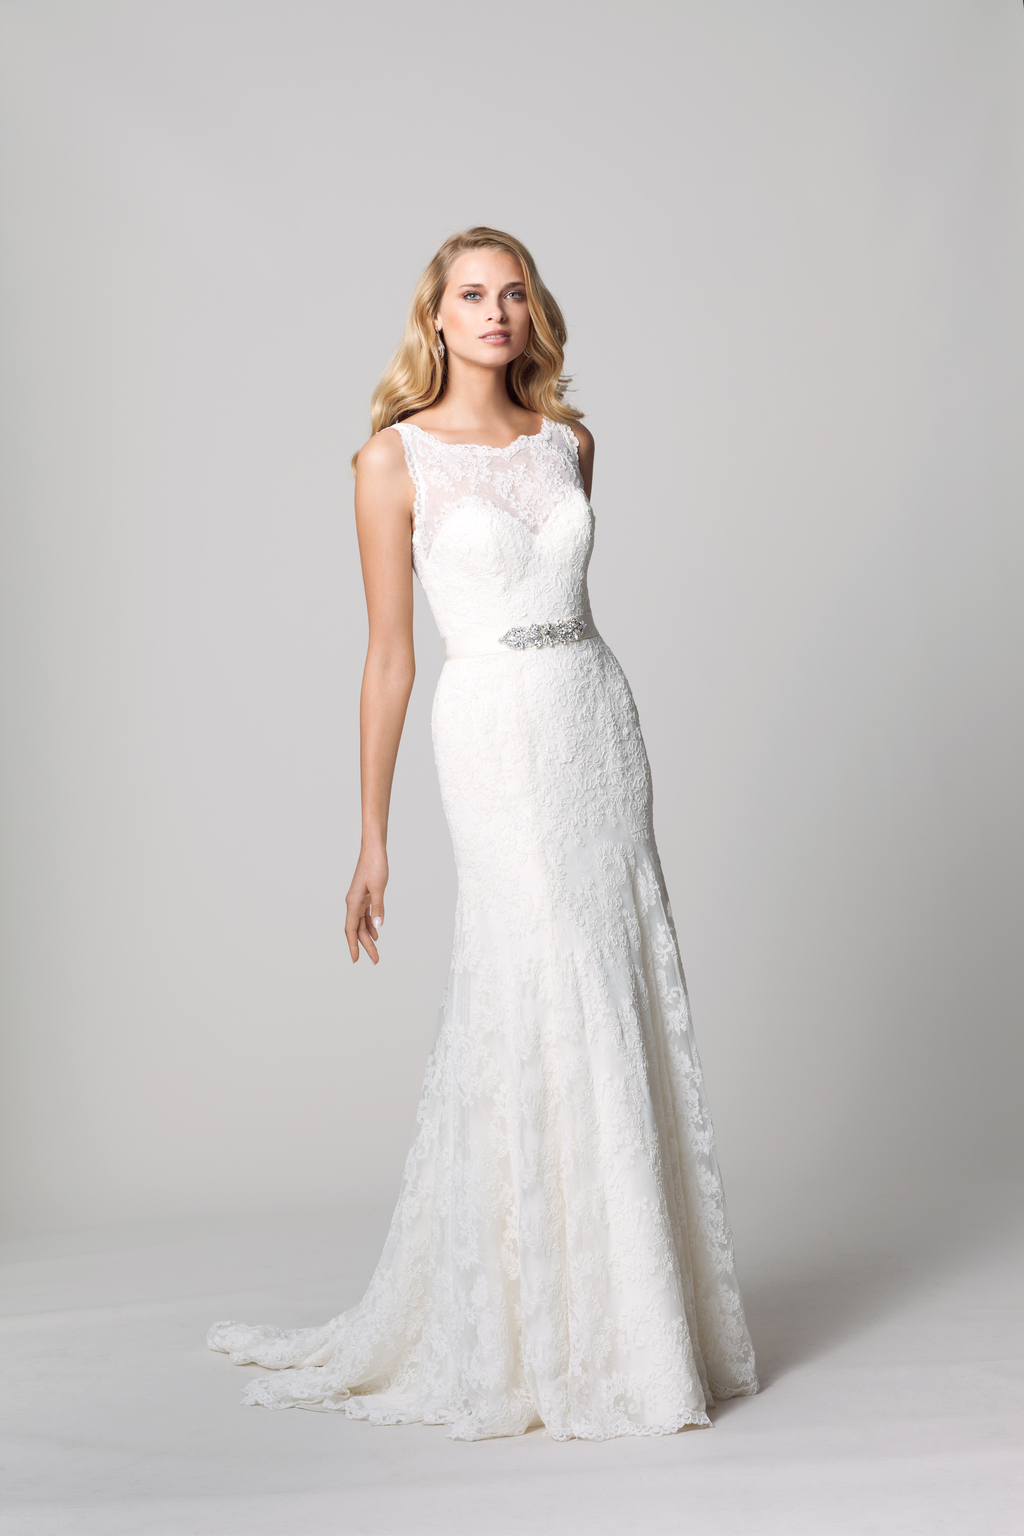 wedding dress london second hand second hand wedding dress Second Hand Wedding Dresses London Uk Design Your Dress